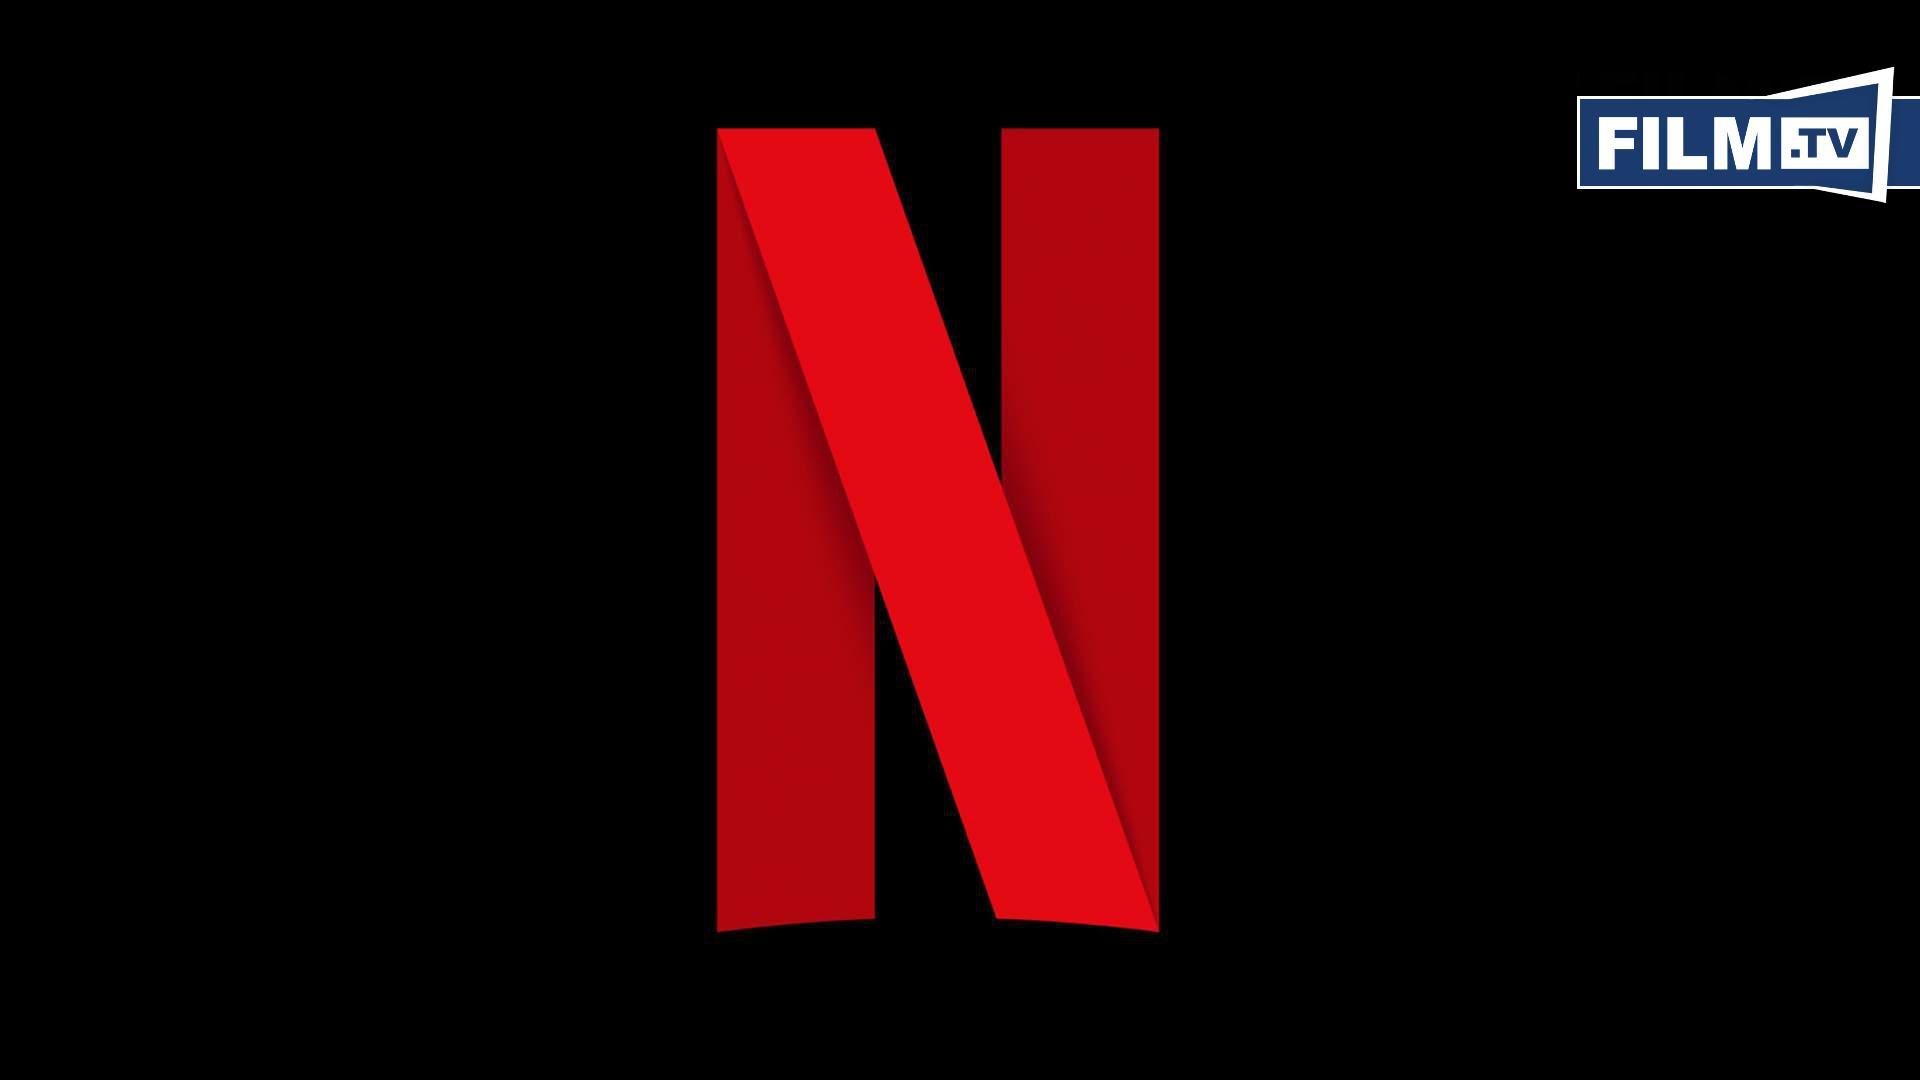 STREAMING: Politiker fordern EU-Quote bei Netflix, Amazon & Co